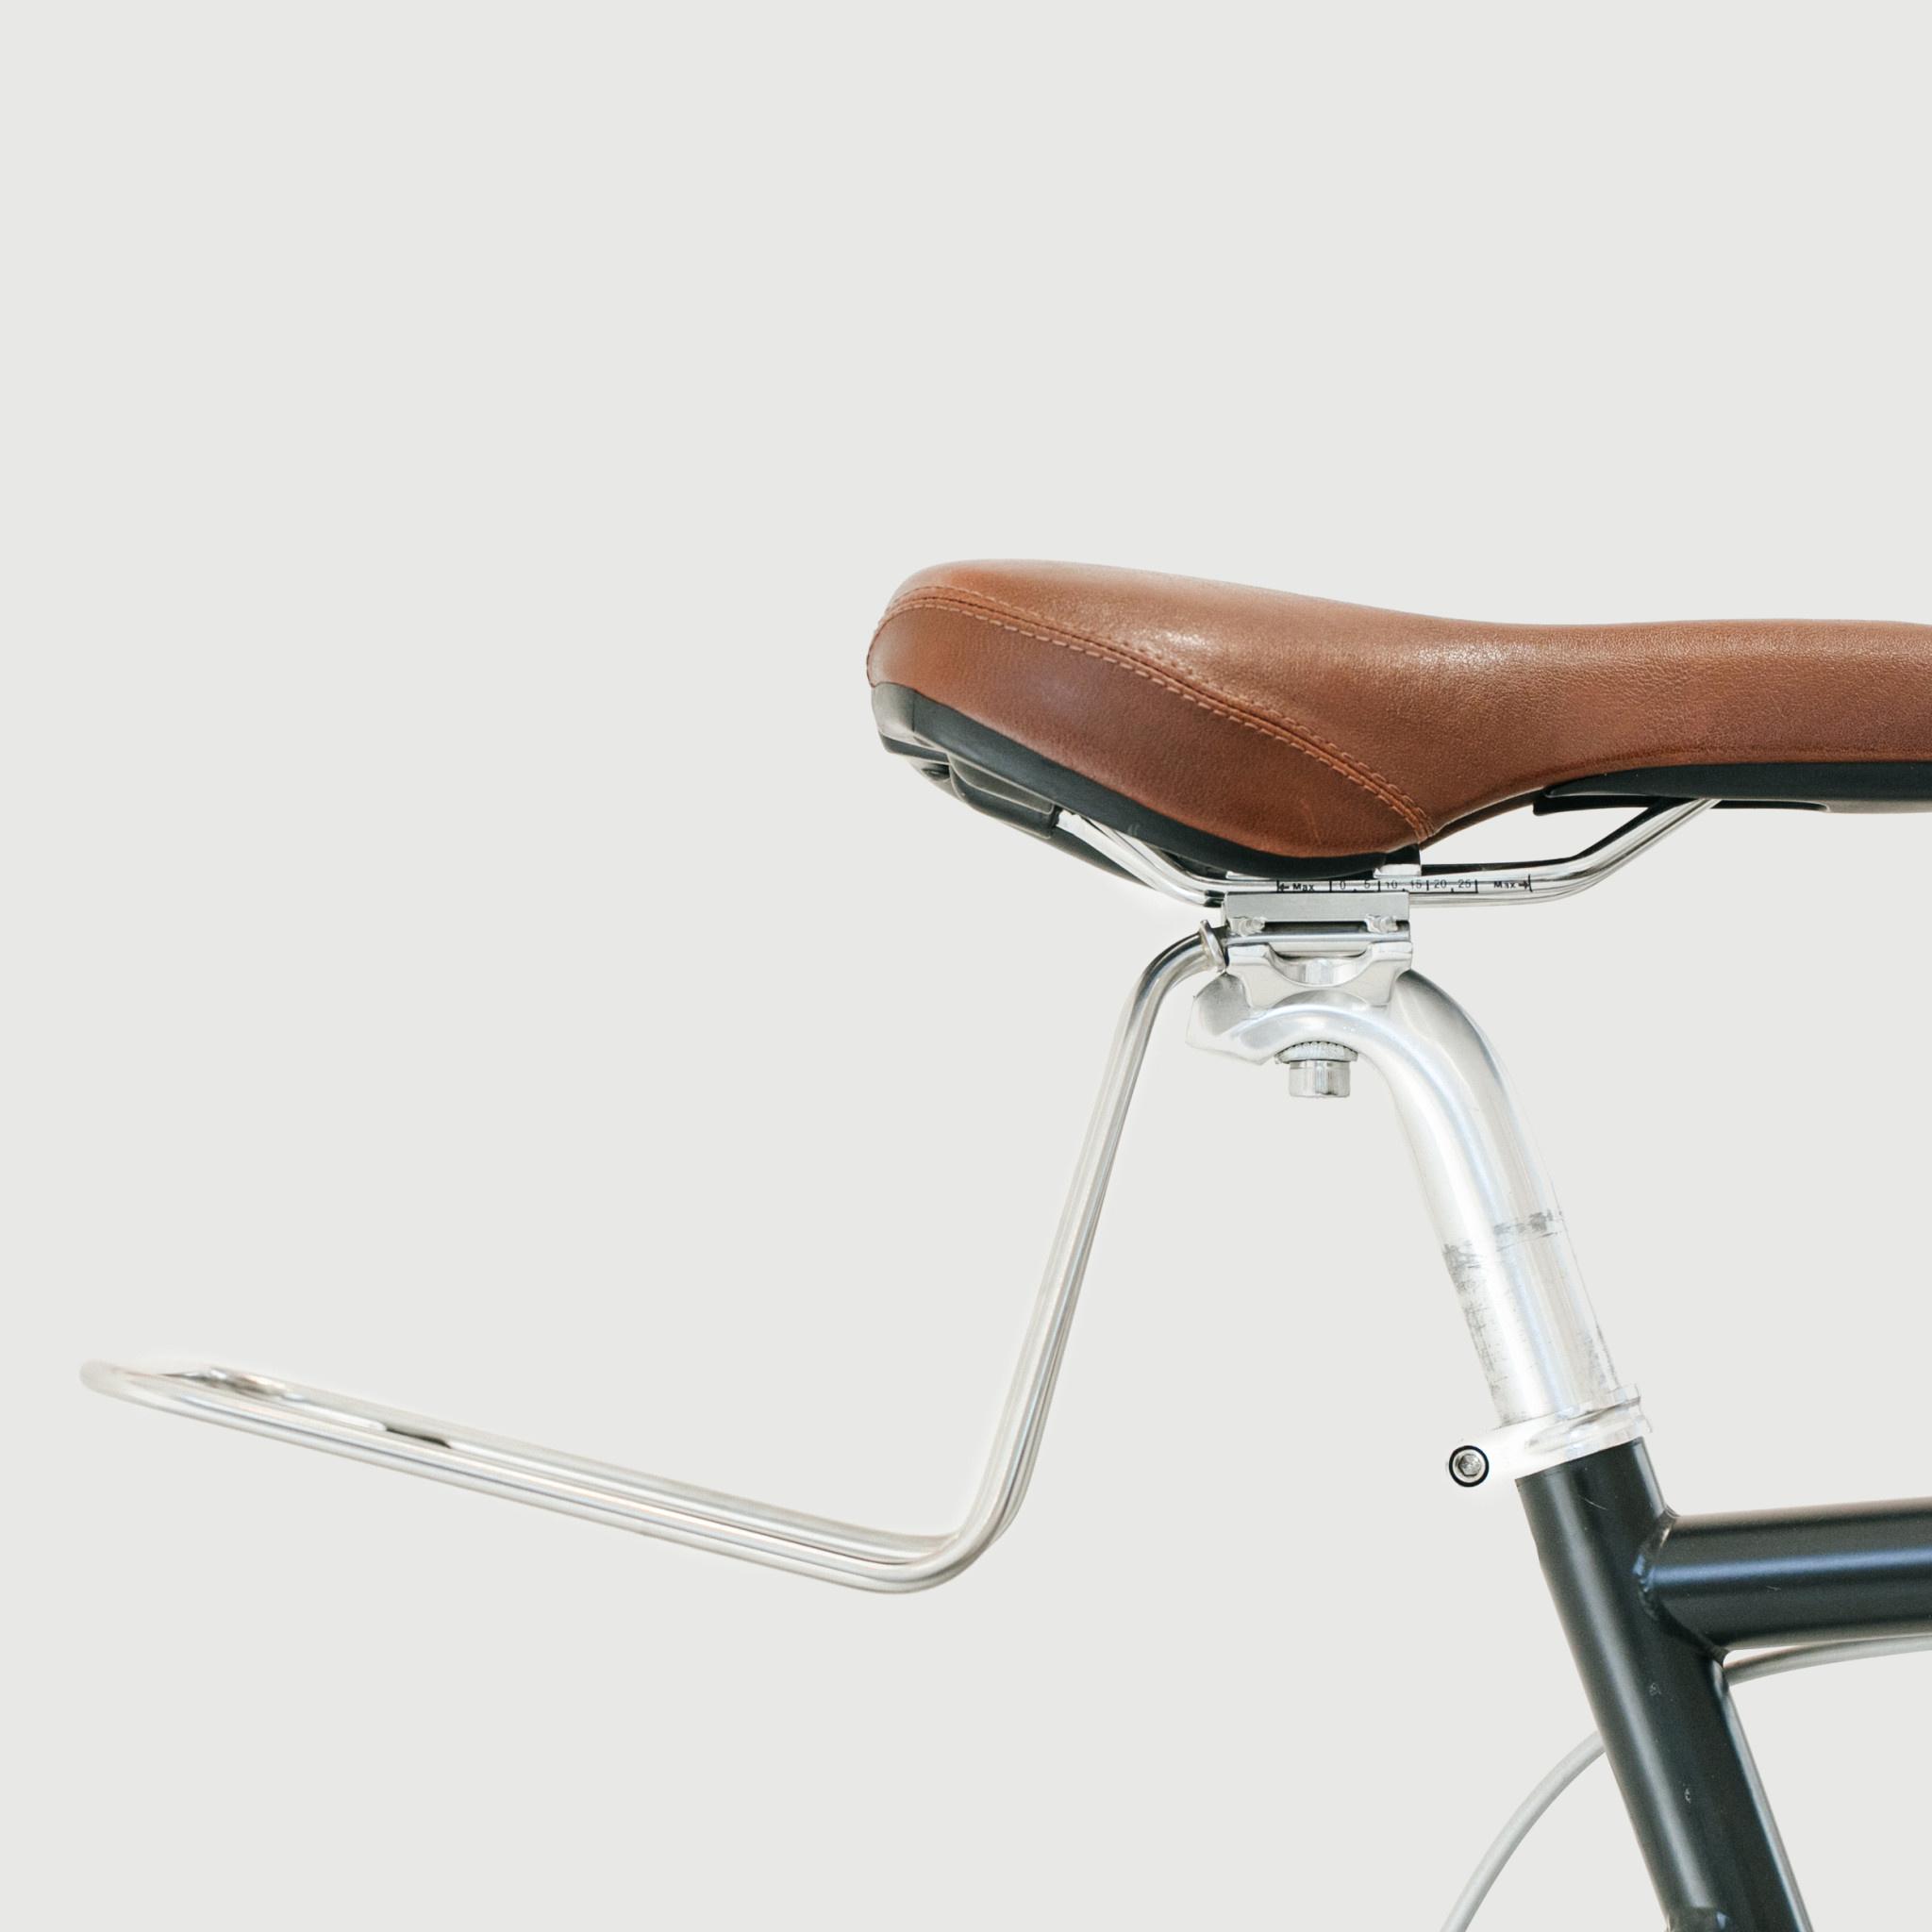 Ocean Air Cycles OCEAN AIR CYCLES × NITTO, Erlen saddle bag support